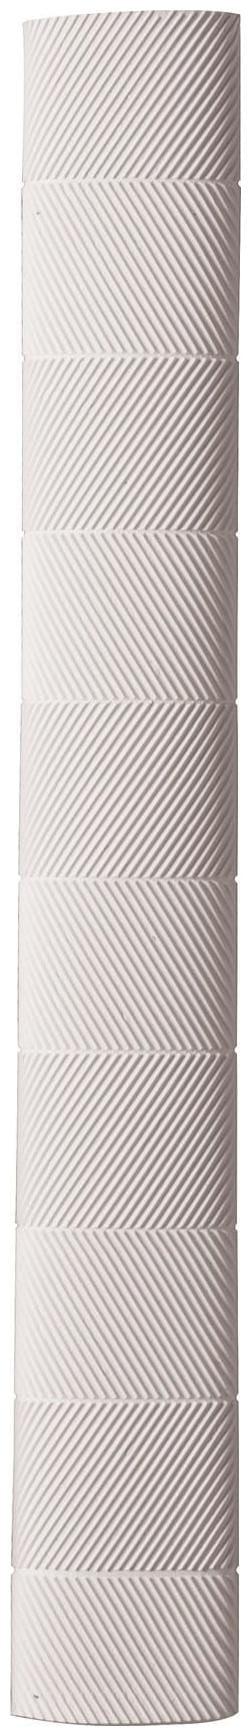 st gold bat grip (pack of 6) white